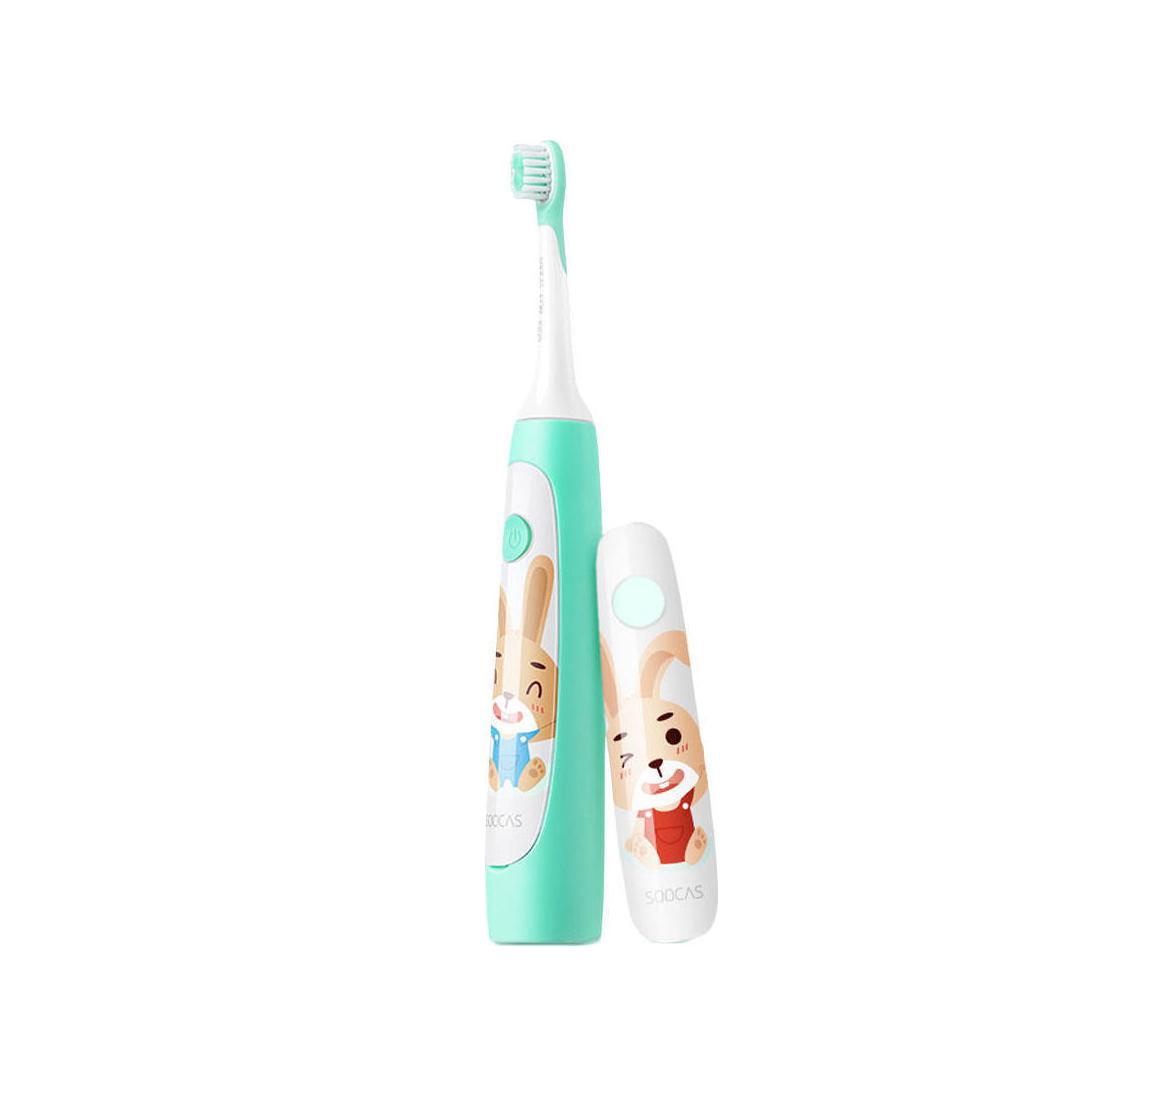 Soocas Sonic Electronic Toothbrush C1 for Kids Green Ηλεκτρική Οδοντόβουρτσα (2 χρόνια εγγύηση)